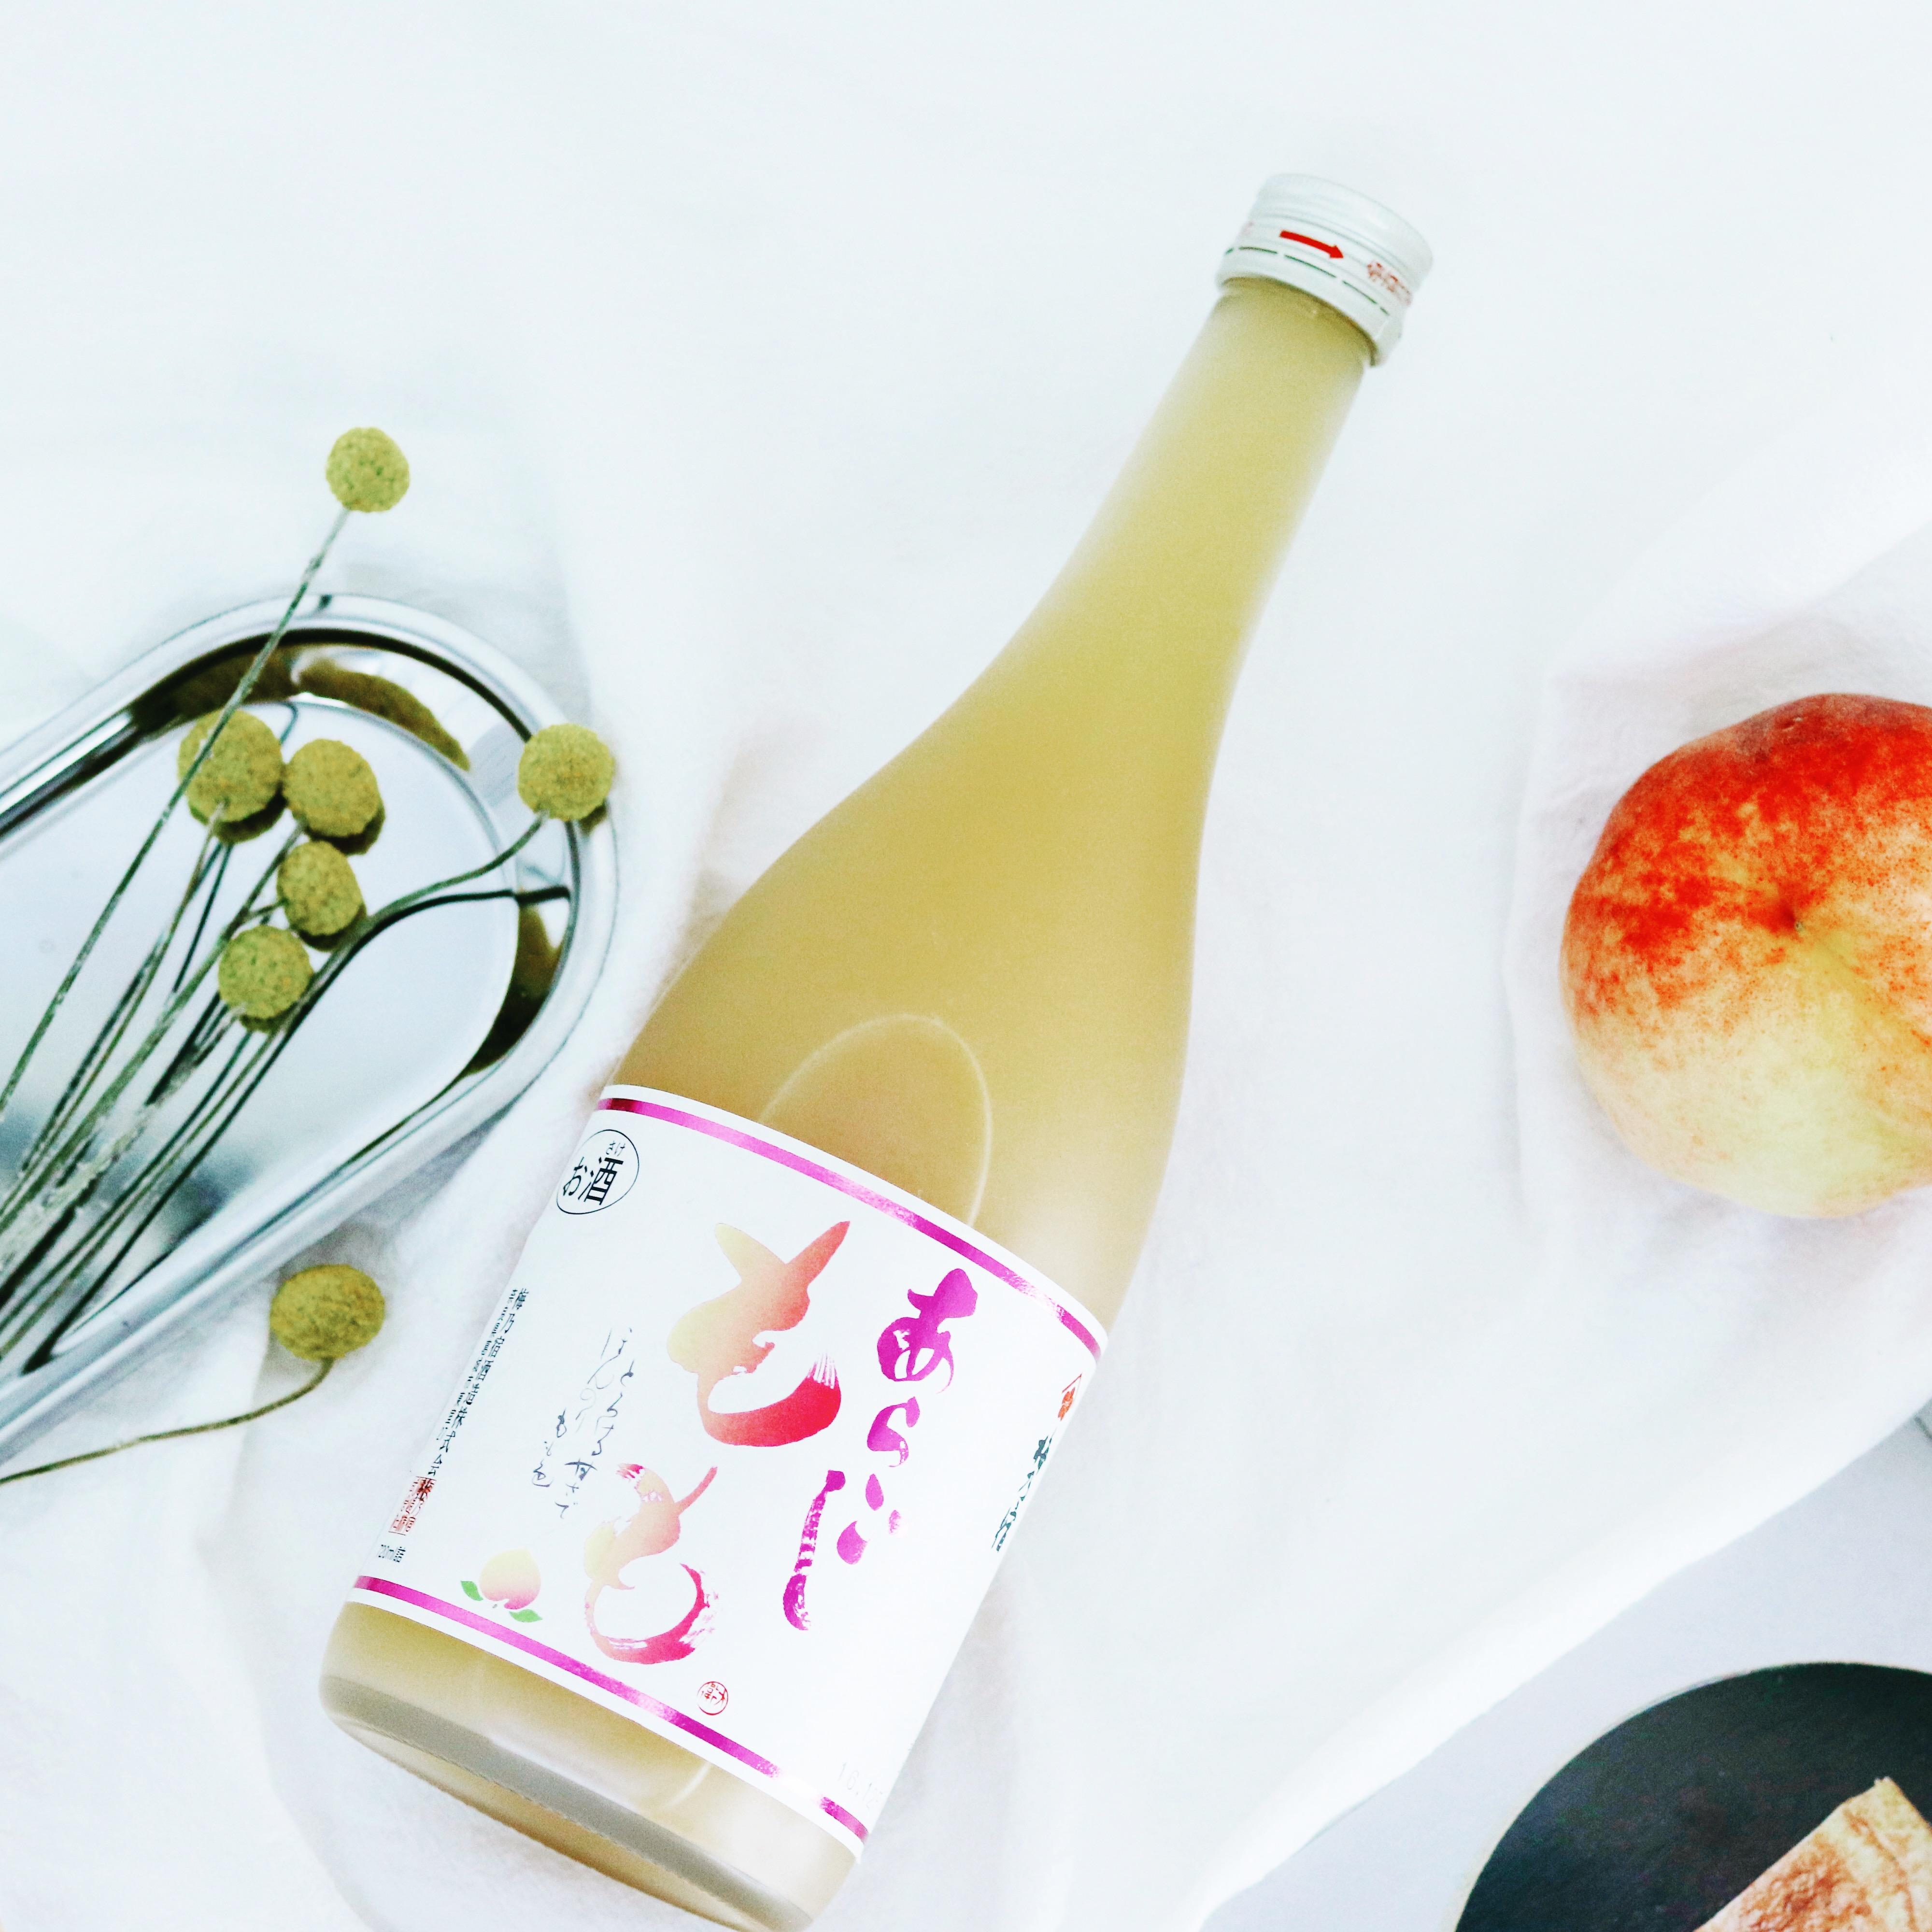 720ml ;女士酸甜可口 deg & 8 日本进口果肉利口酒果酒 桃子酒 梅乃宿